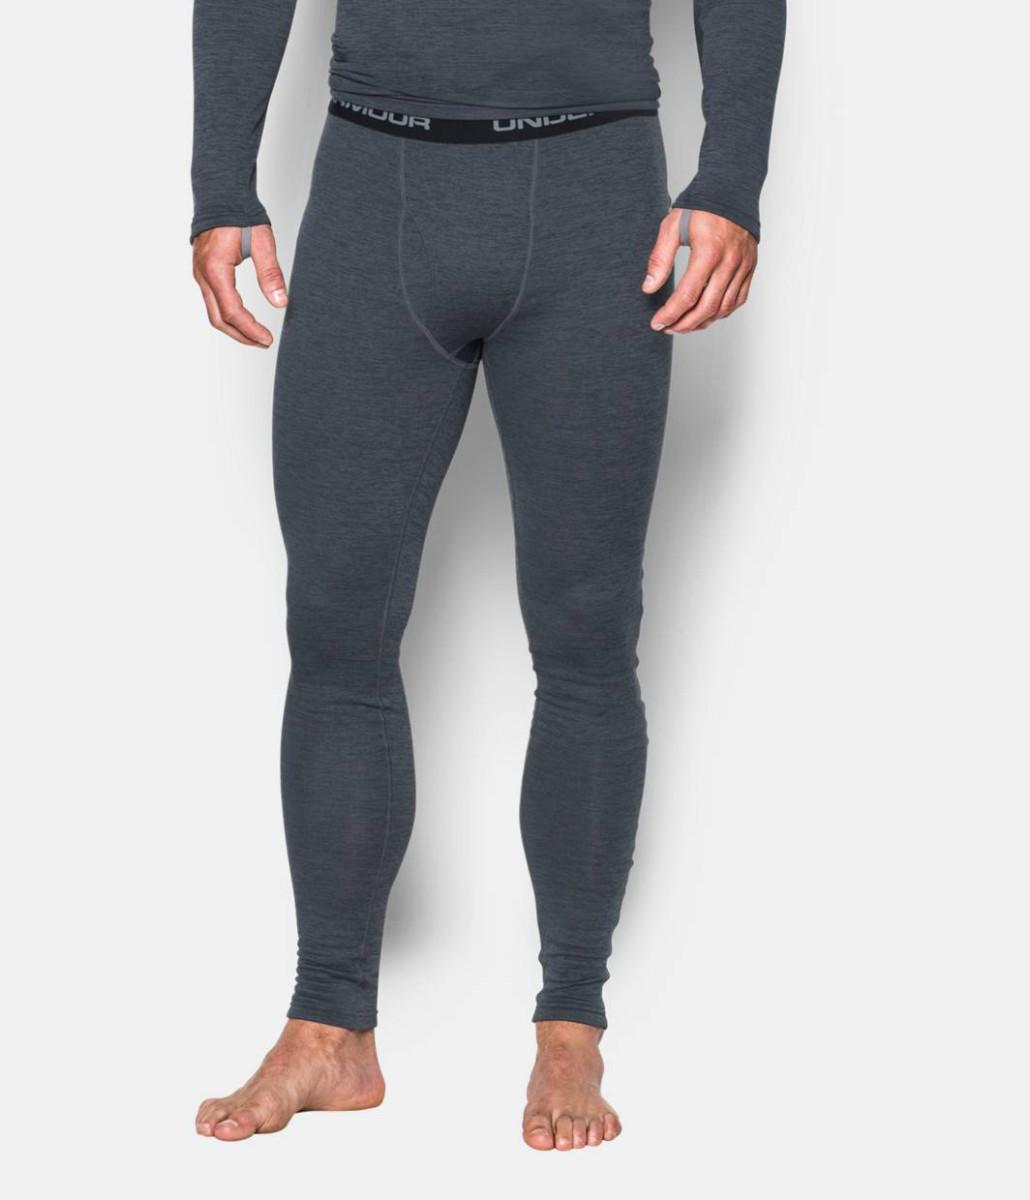 ua-heat-leggings.jpg